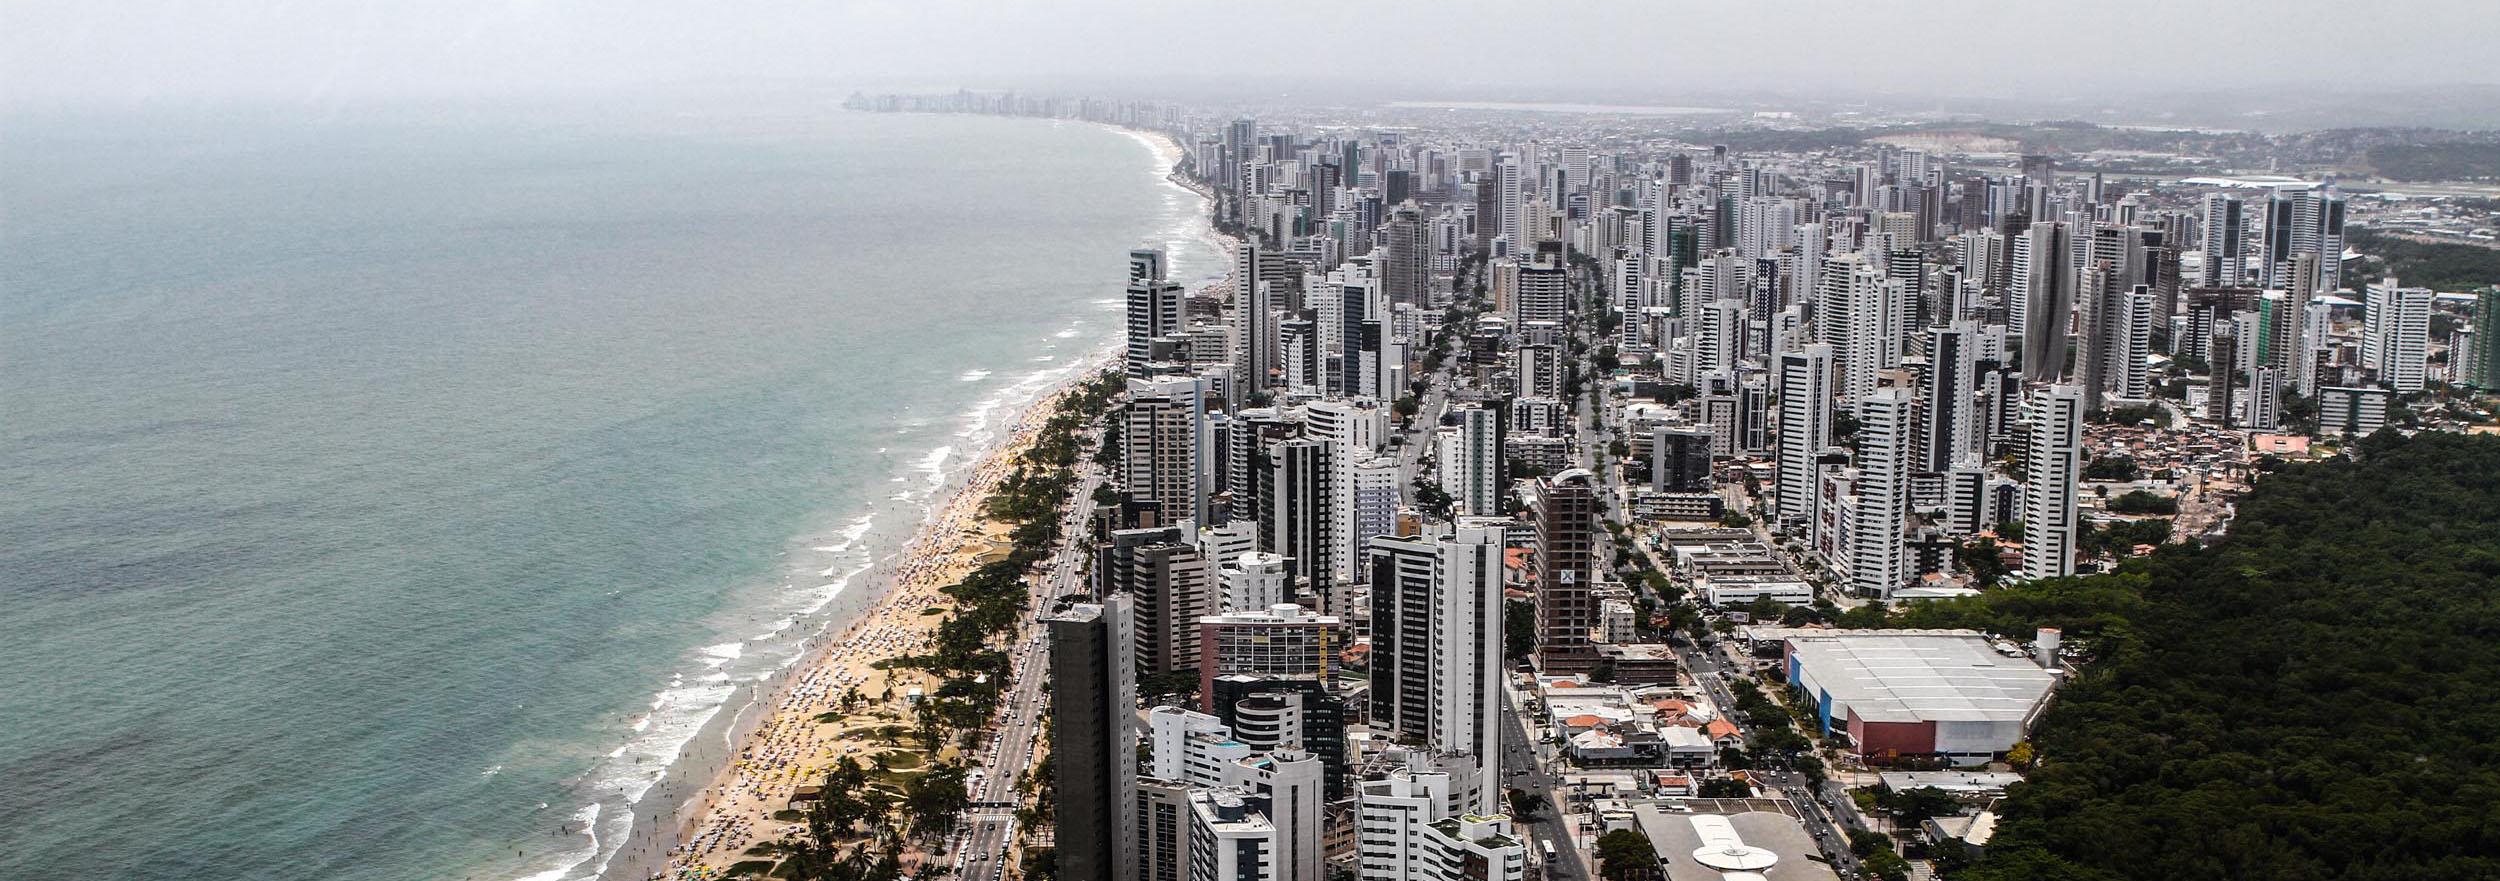 Praia de Boa Viagem - Foto: Marcos Pastich/PCR